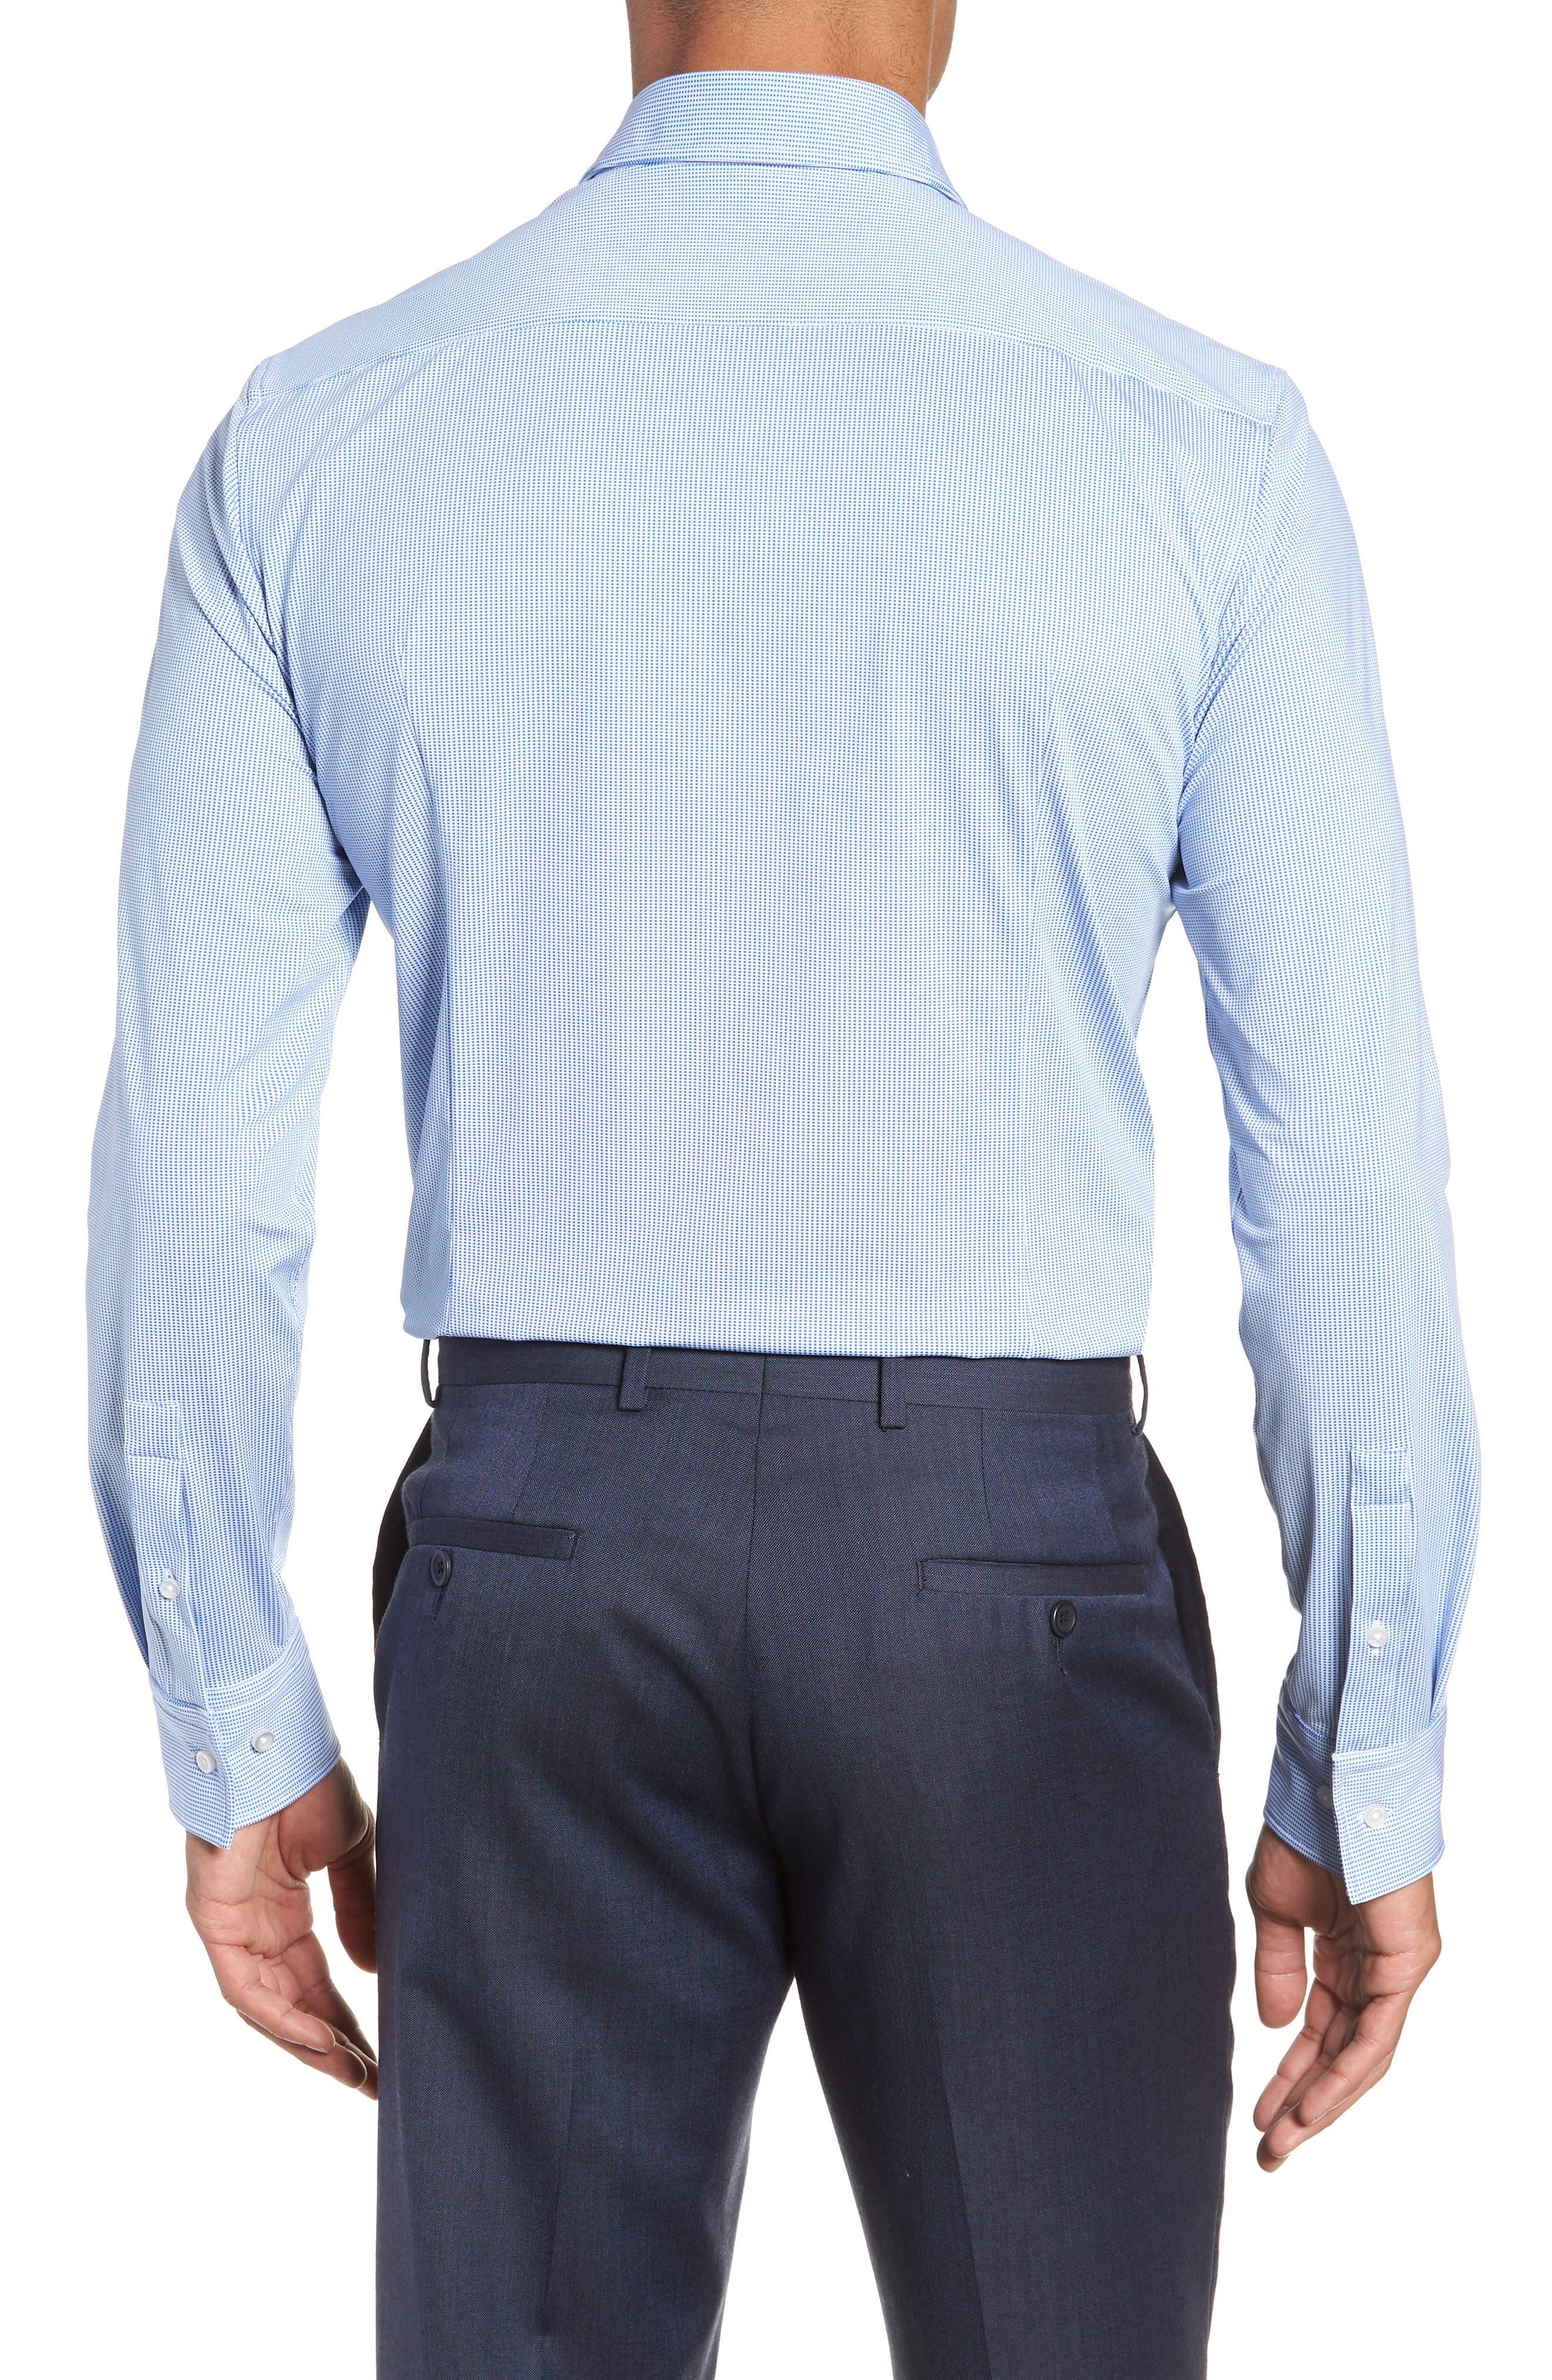 Jenno Slim Fit Stretch Check Dress Shirt,                             Alternate thumbnail 3, color,                             BLUE